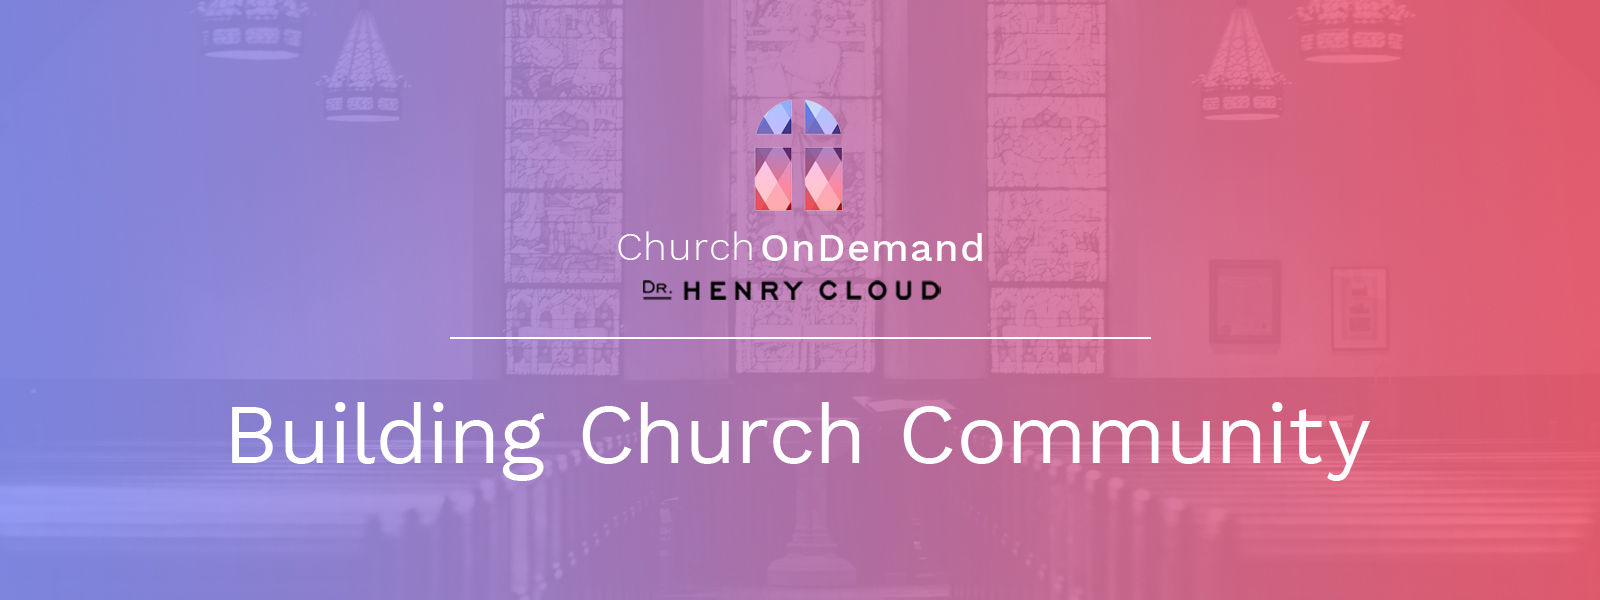 Building Church Community